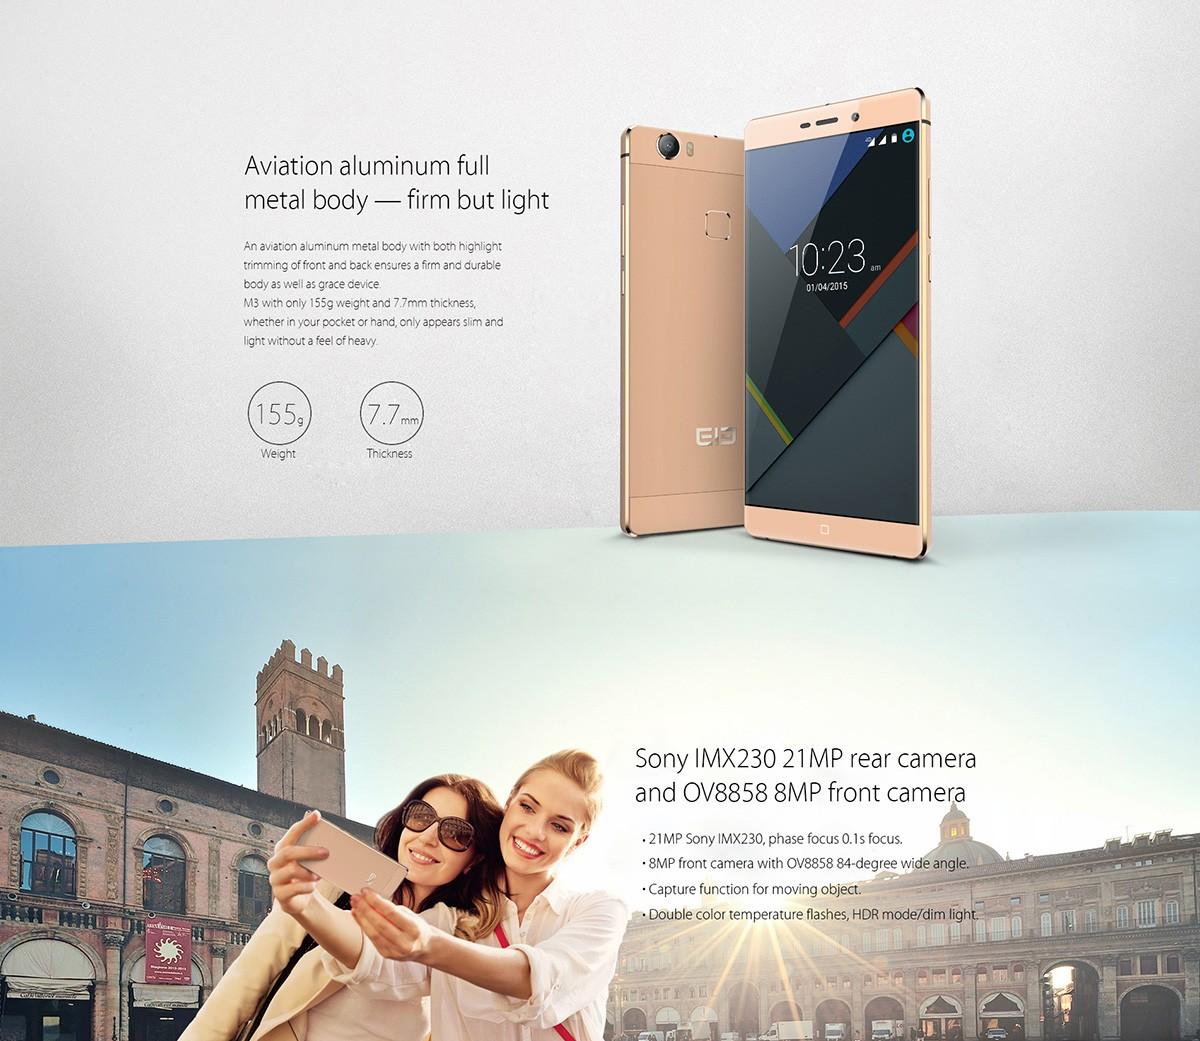 Elephone M3, bester Preis, Angebot, Antutu Test, Testbericht, China Smartphone, Handy ohne Vertrag, günstig Smartphone